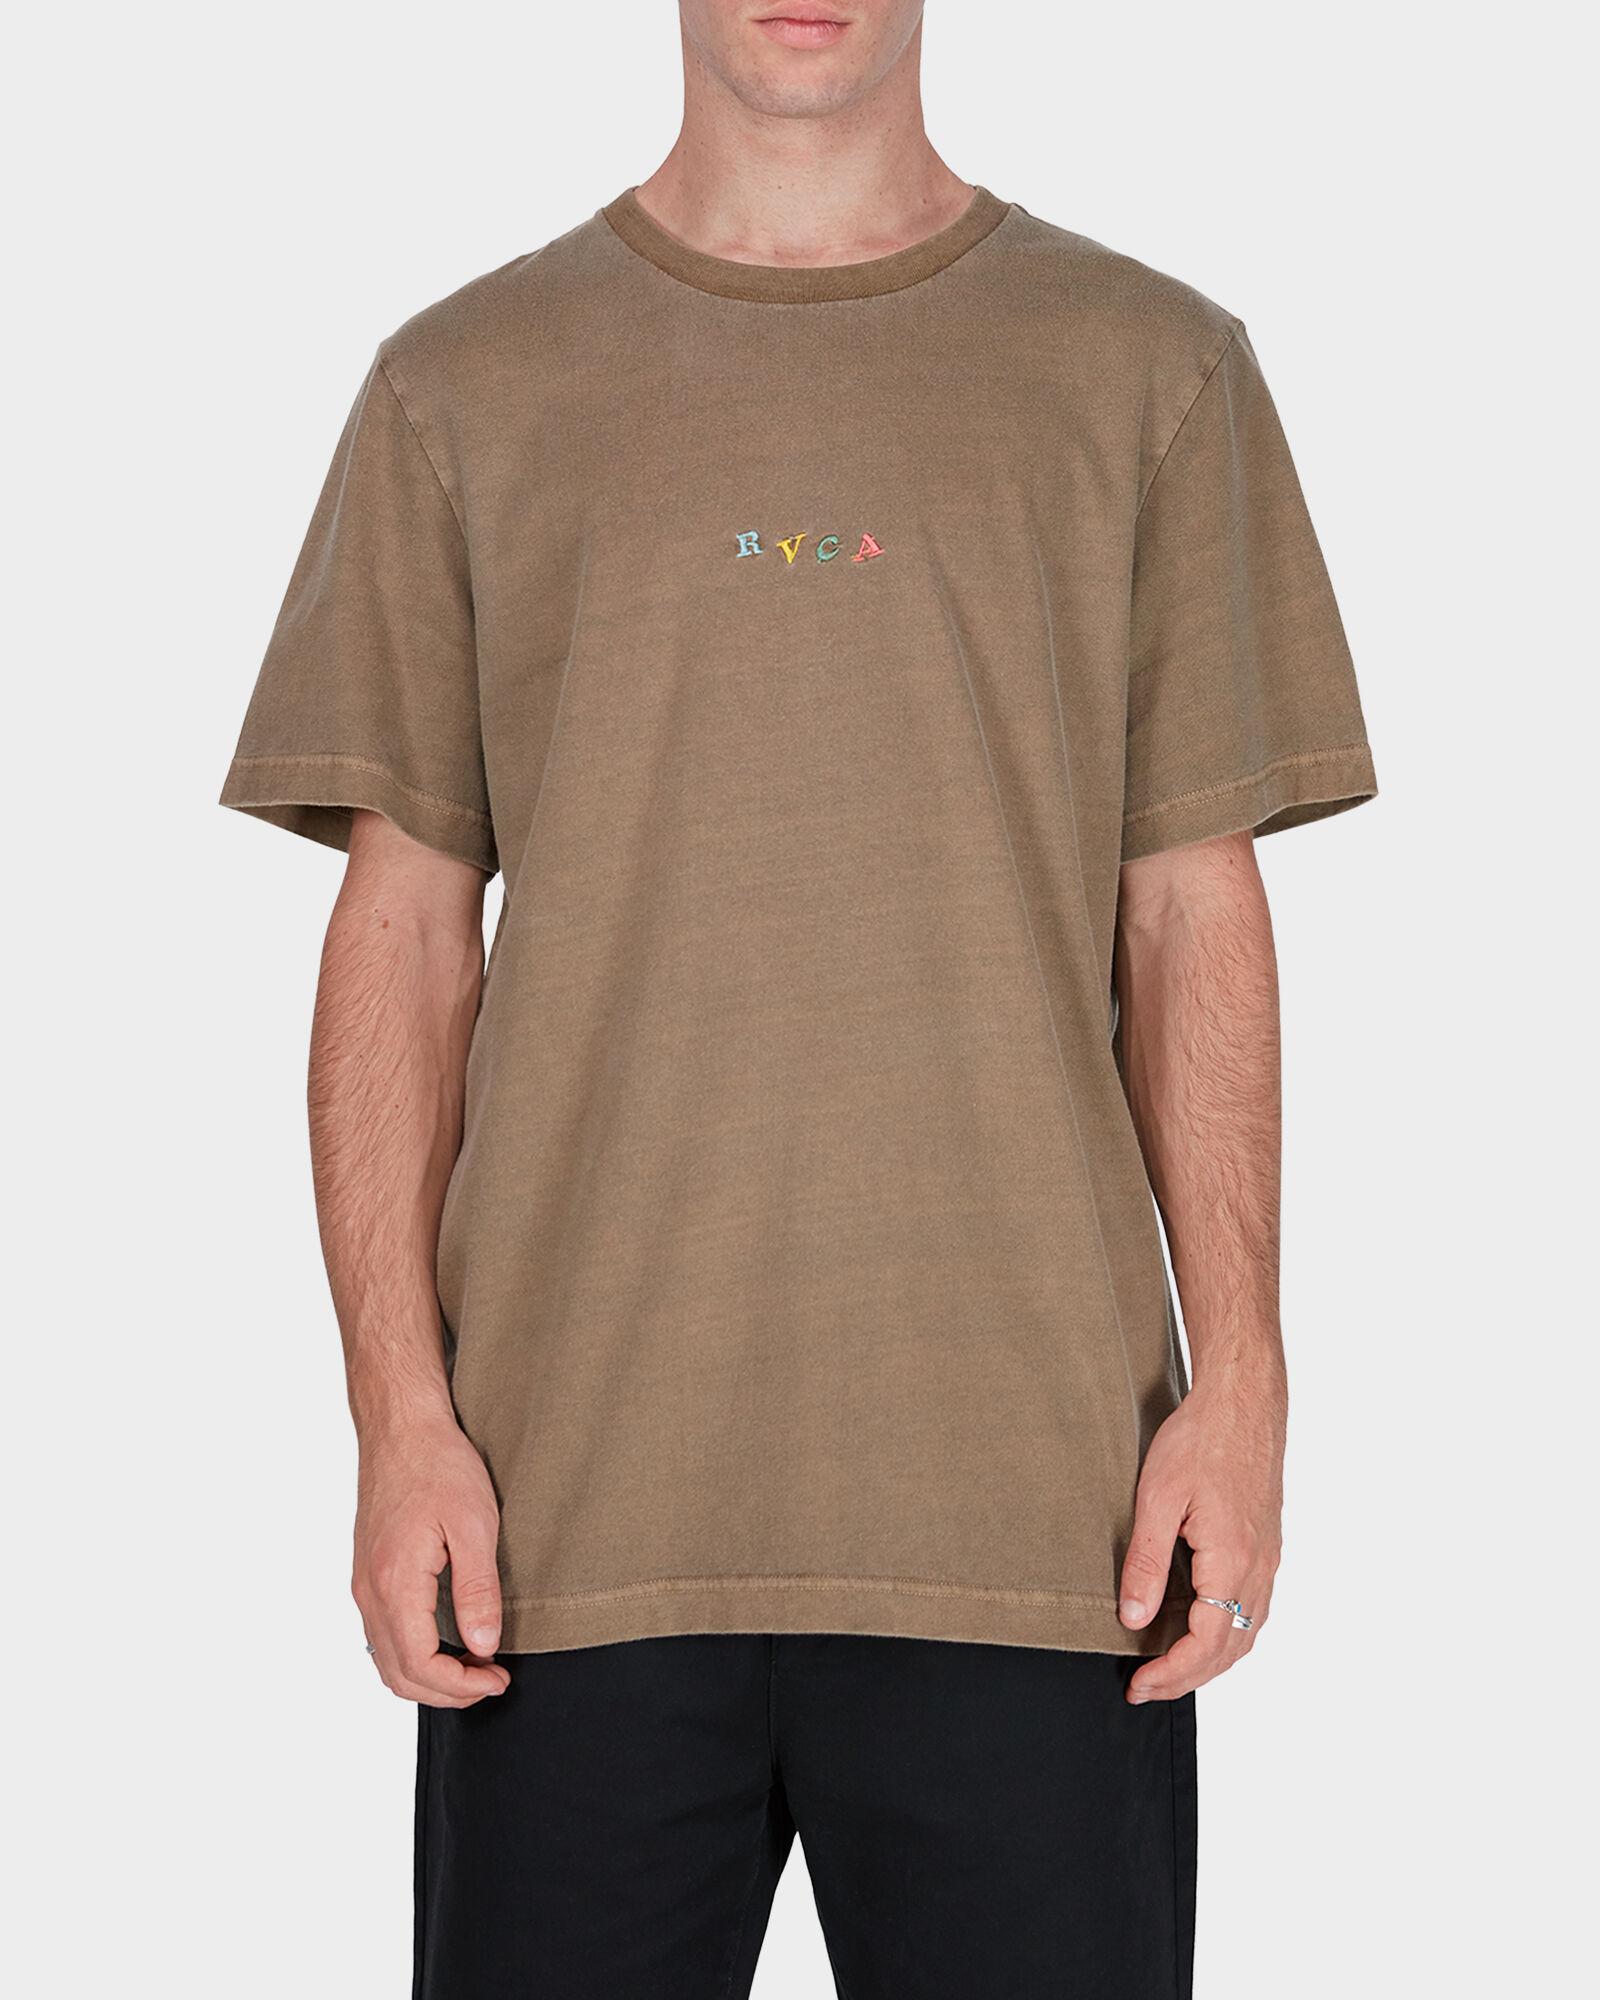 RVCA Mens Crypt Party Short Sleeve T-Shirt